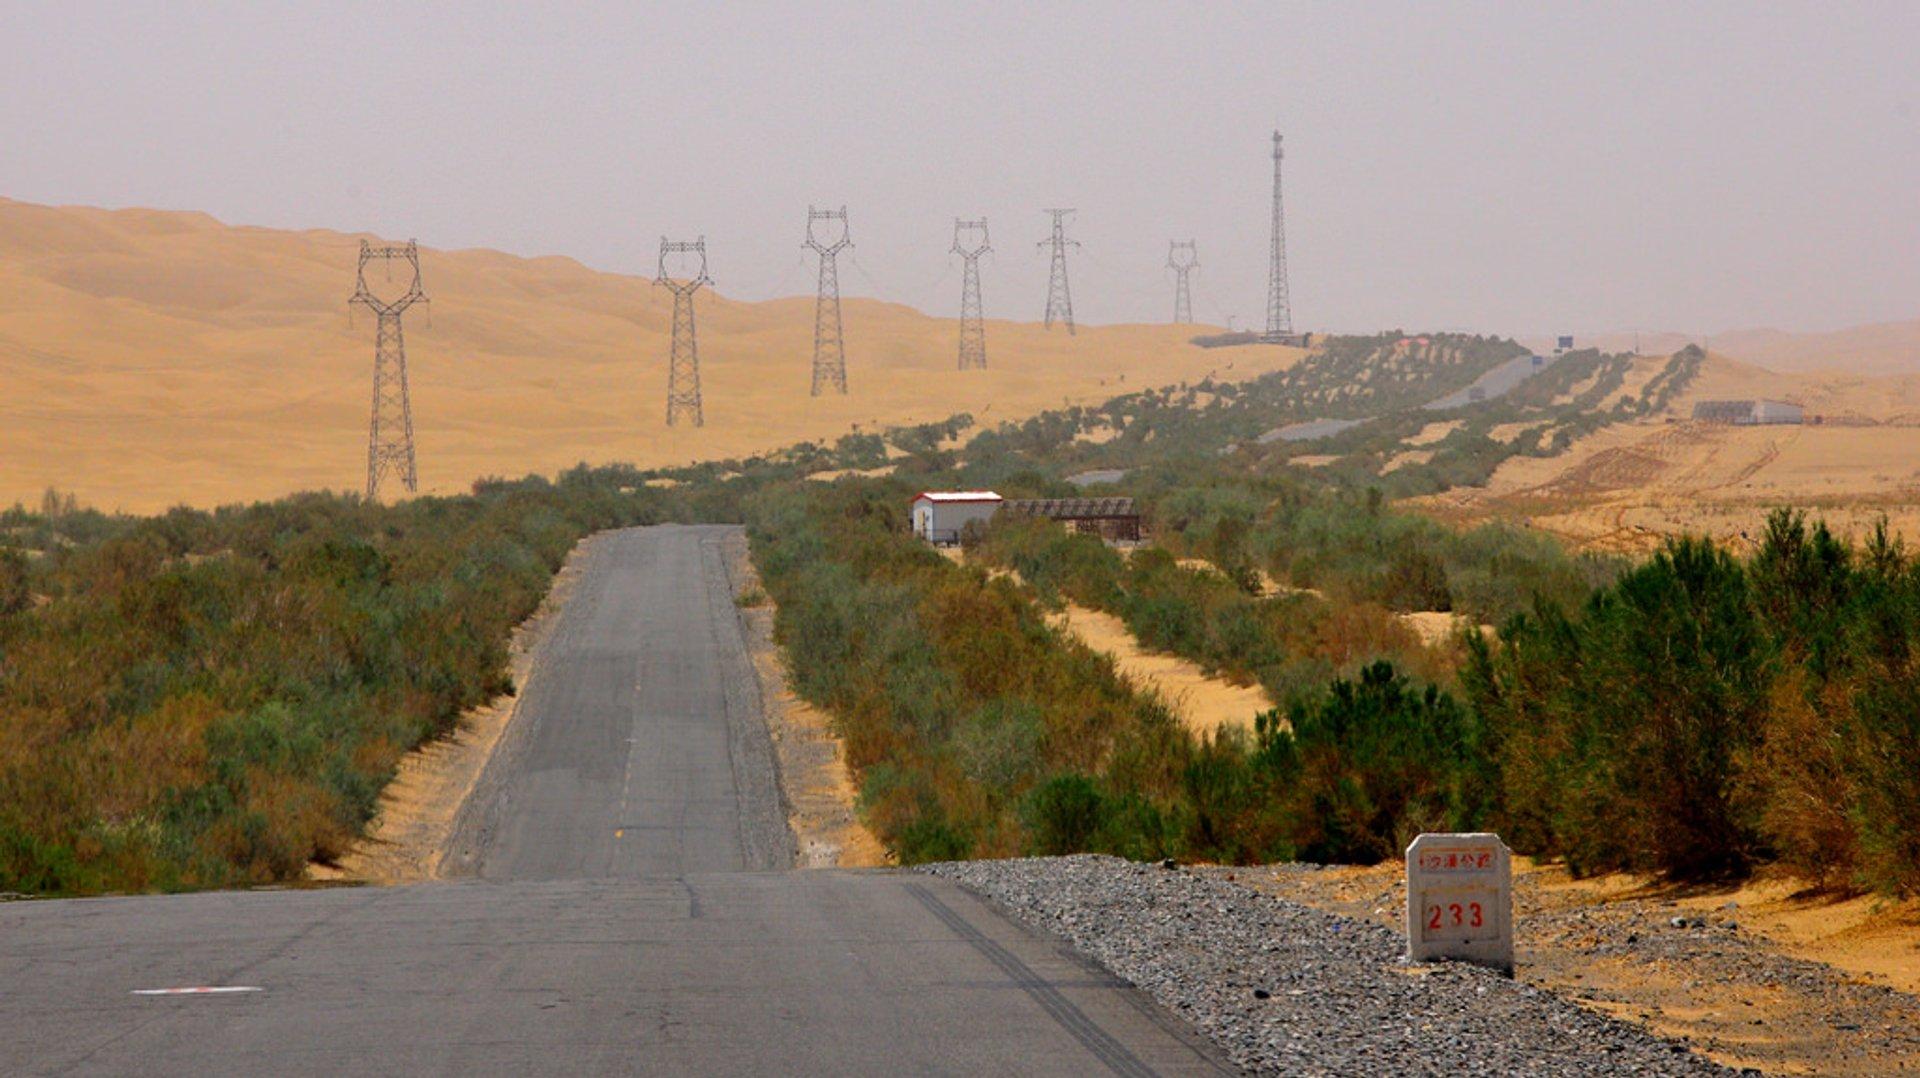 Tarim Desert Highway in China 2019 - Best Time